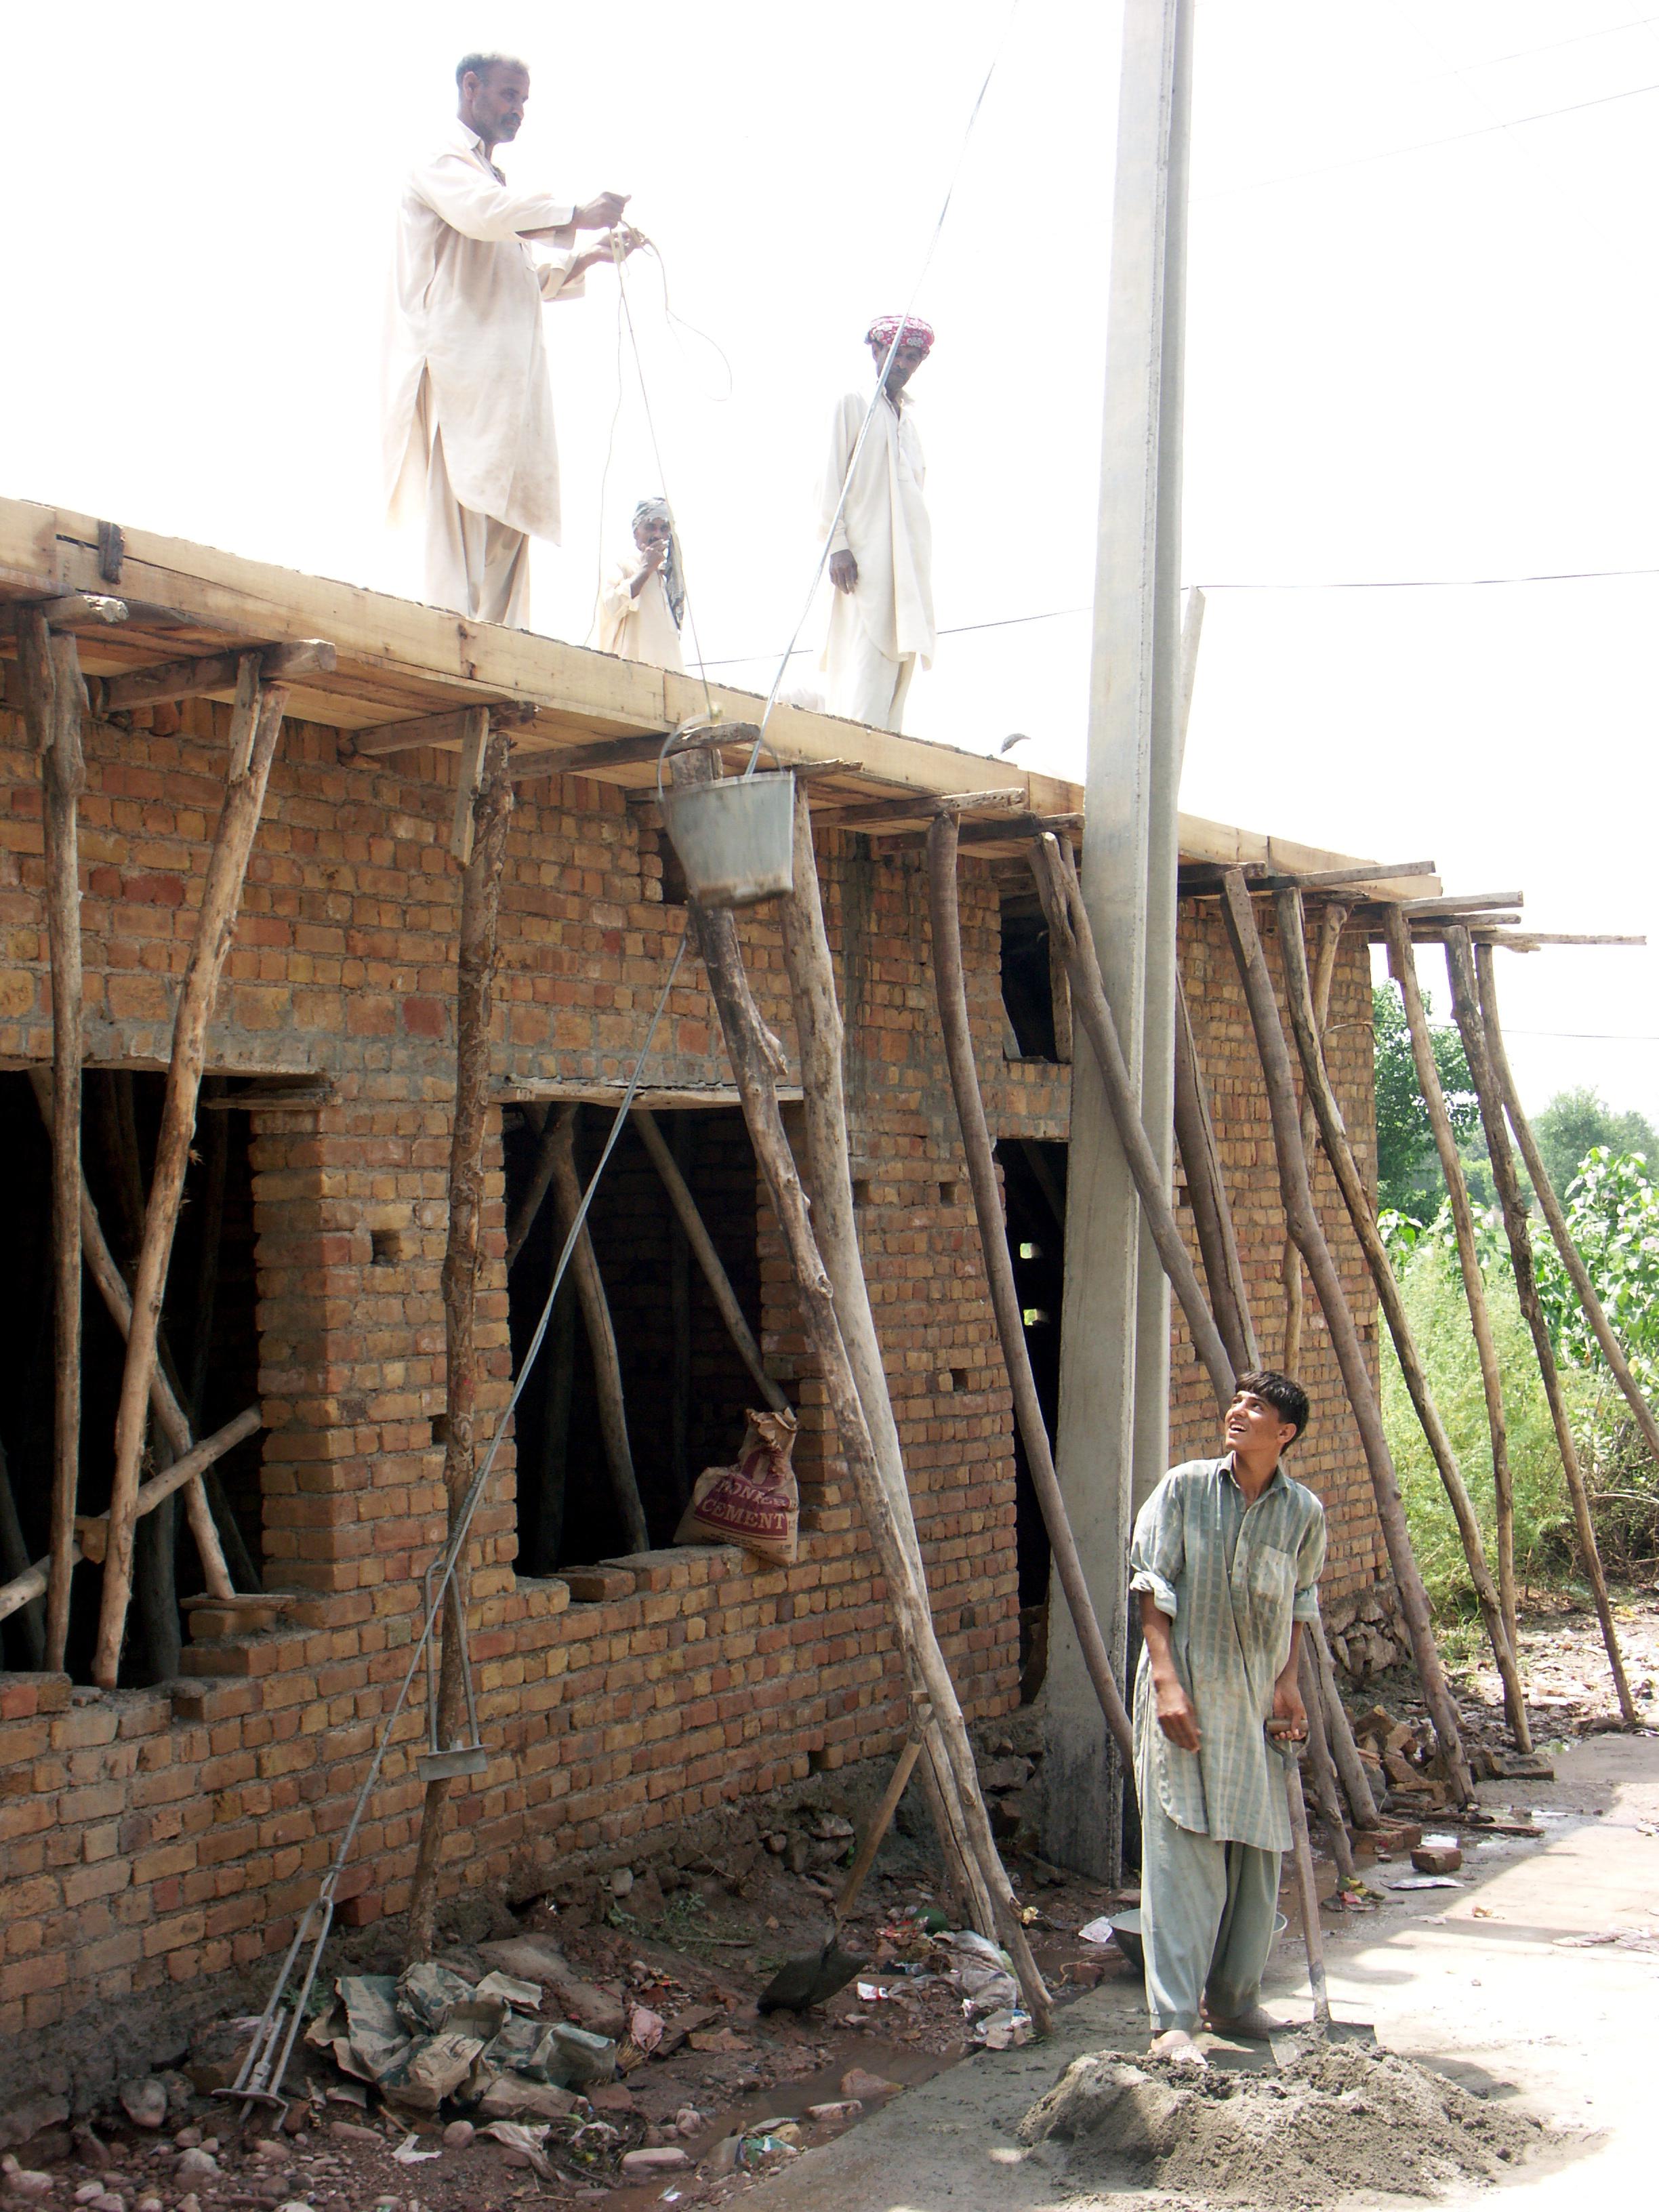 032 PB Construction worker.jpg